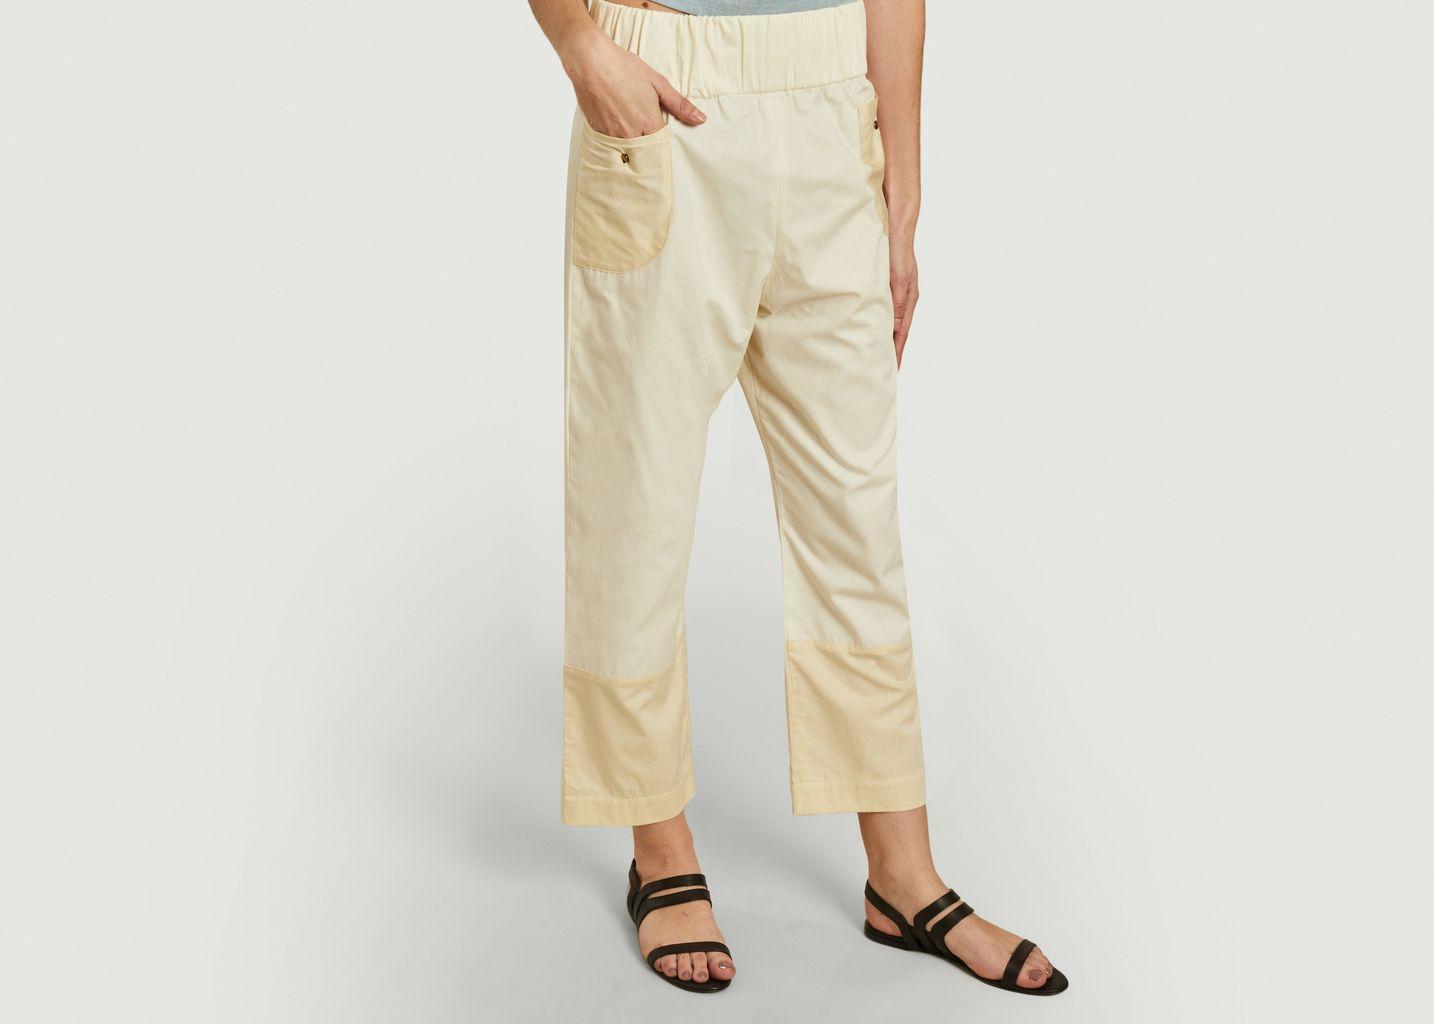 Pantalon Coco  - Gaëlle constantini